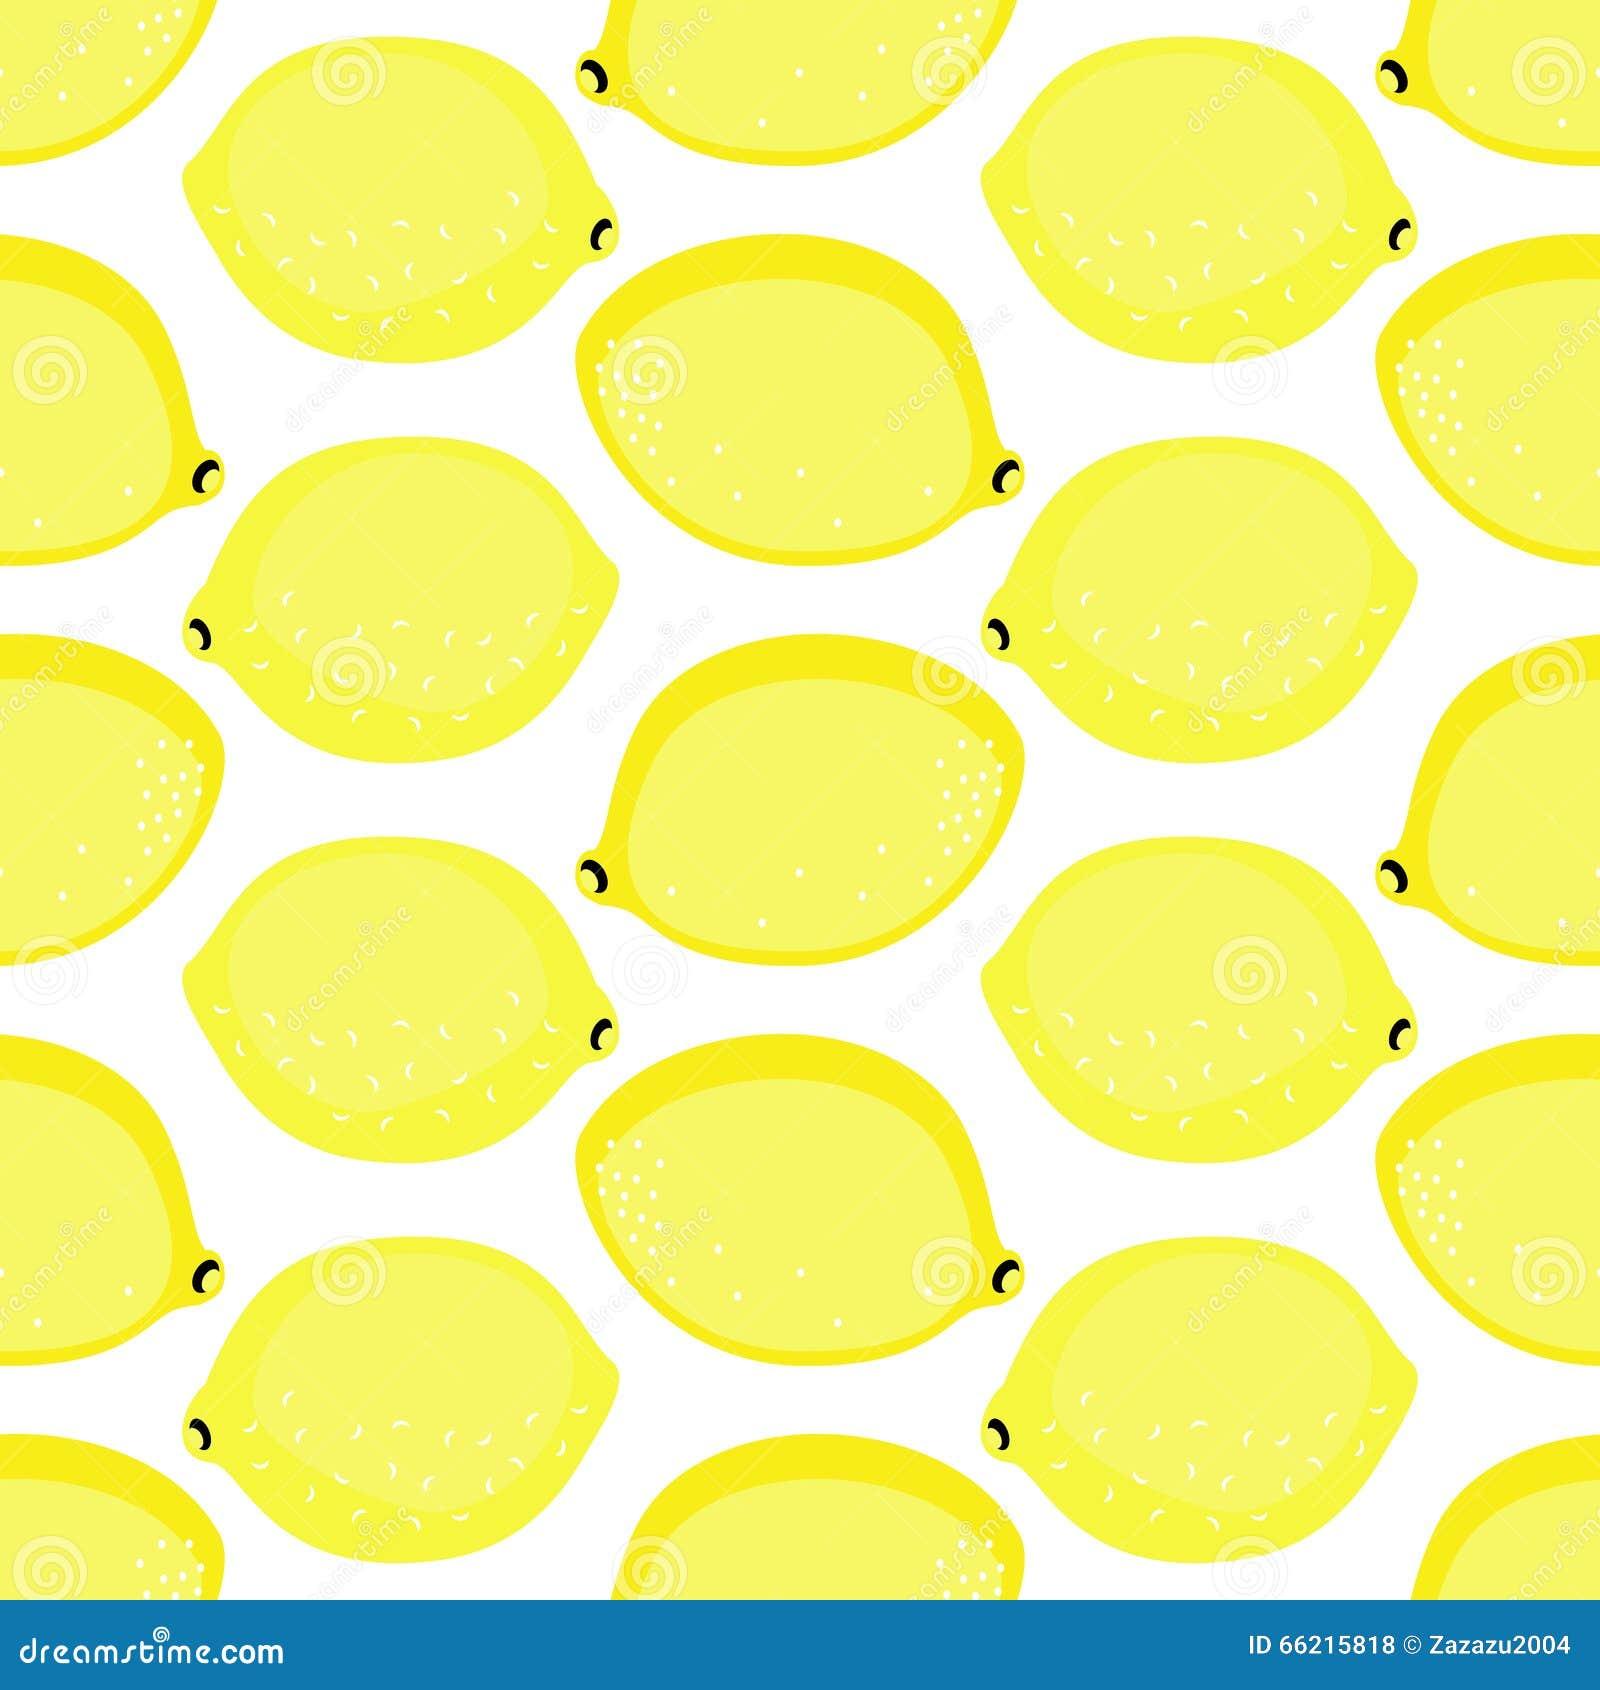 cute yellow pattern wallpaper swordfish clip art silhouette swordfish clip art black and white